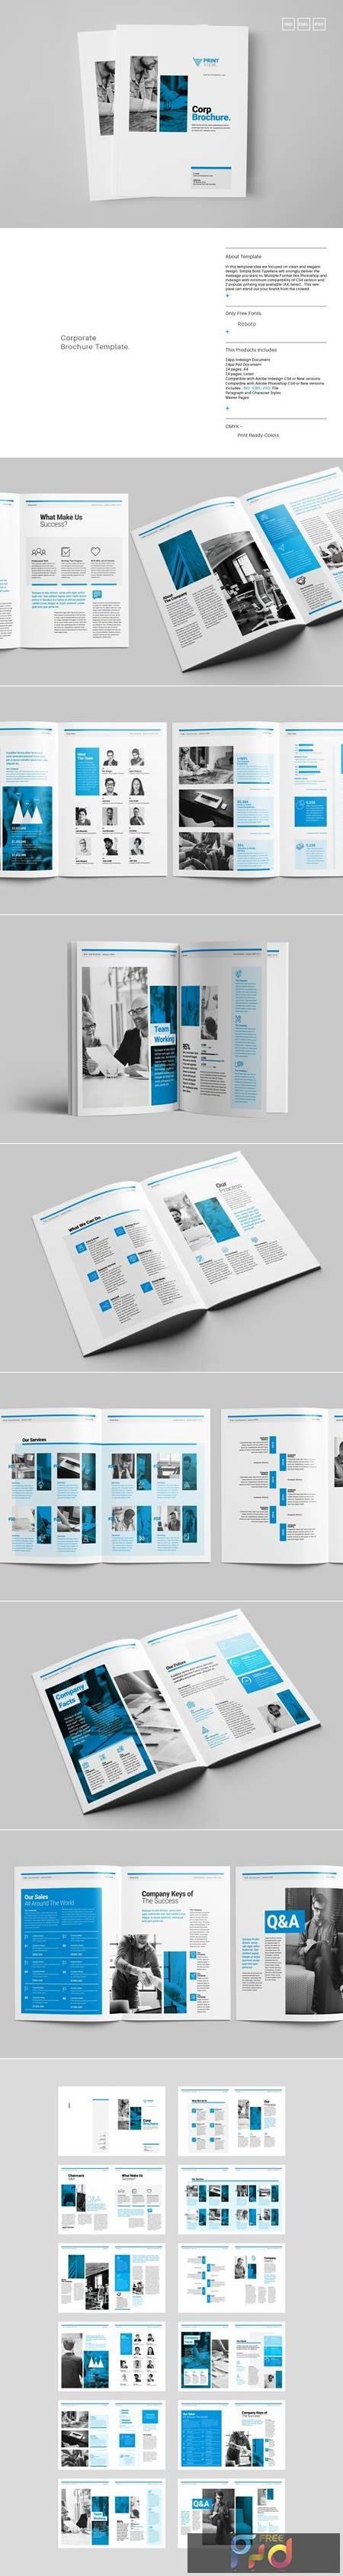 The Brochure 5033946 1